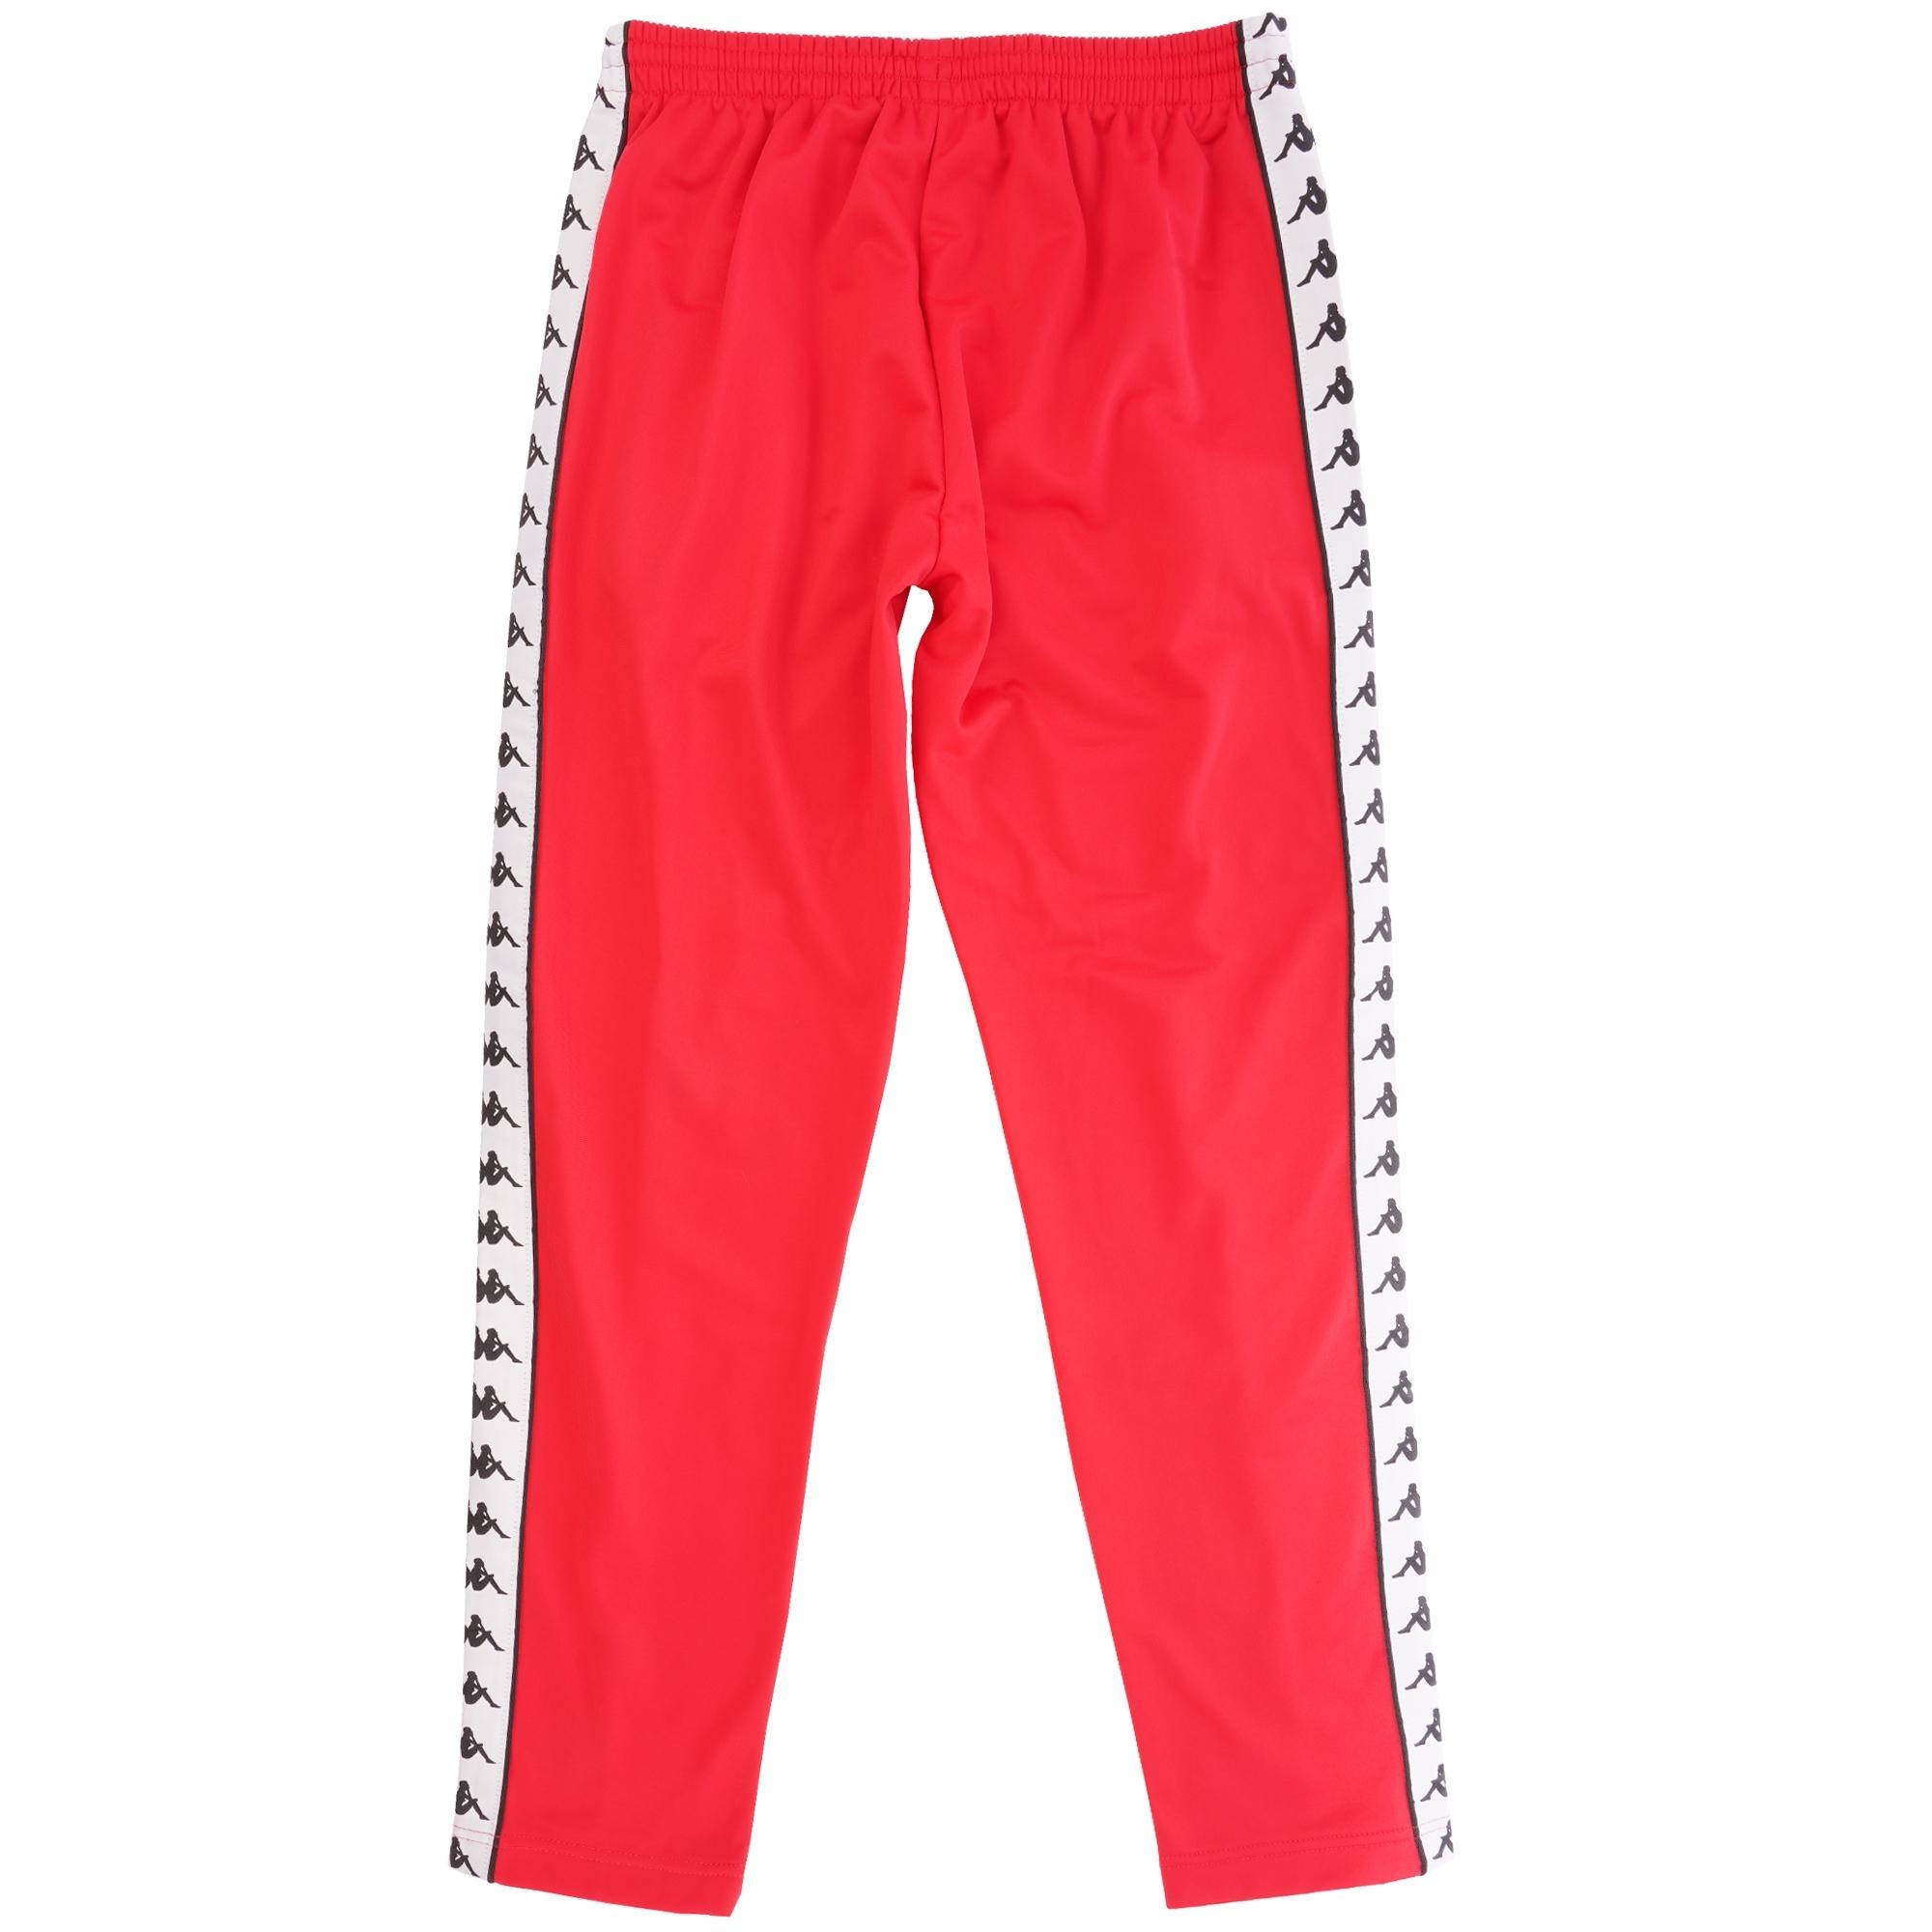 d65fc007 Kappa 222 Banda Astoria Track Pants   Red and Black   301EFS0-C93